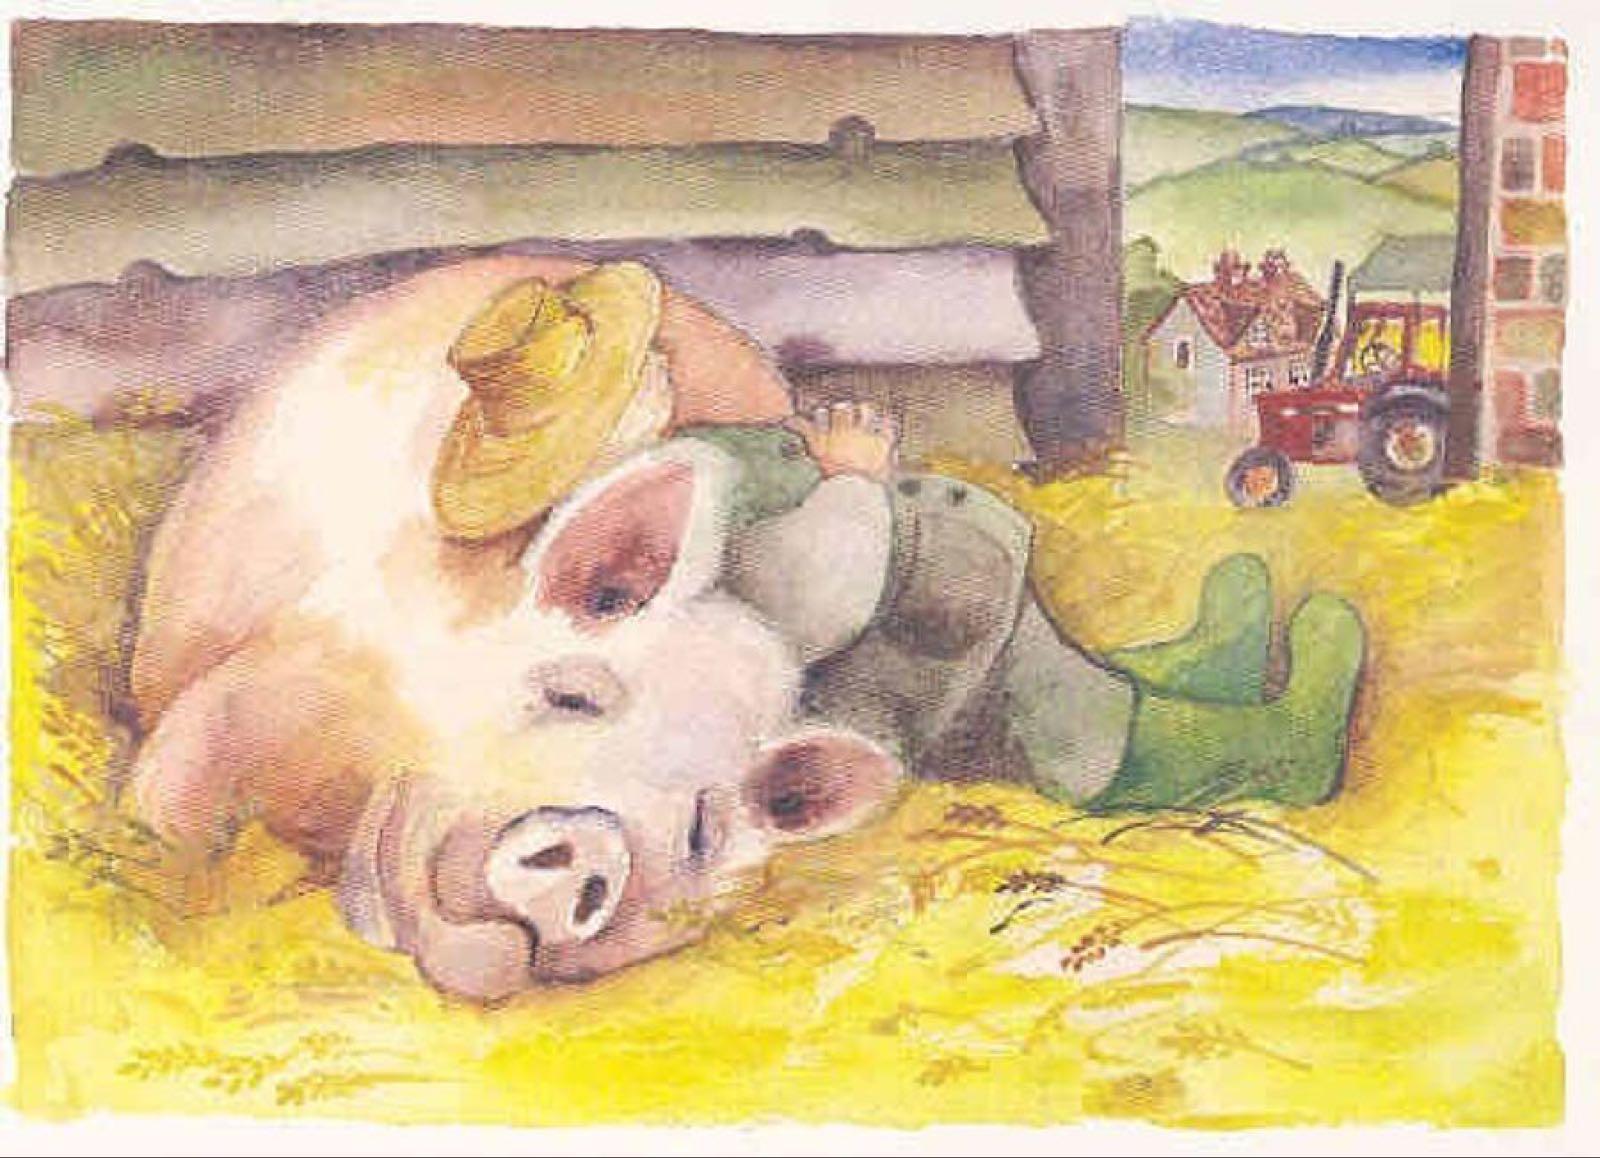 'Farmer & His Pig' Furzedown Gallery Mini Card